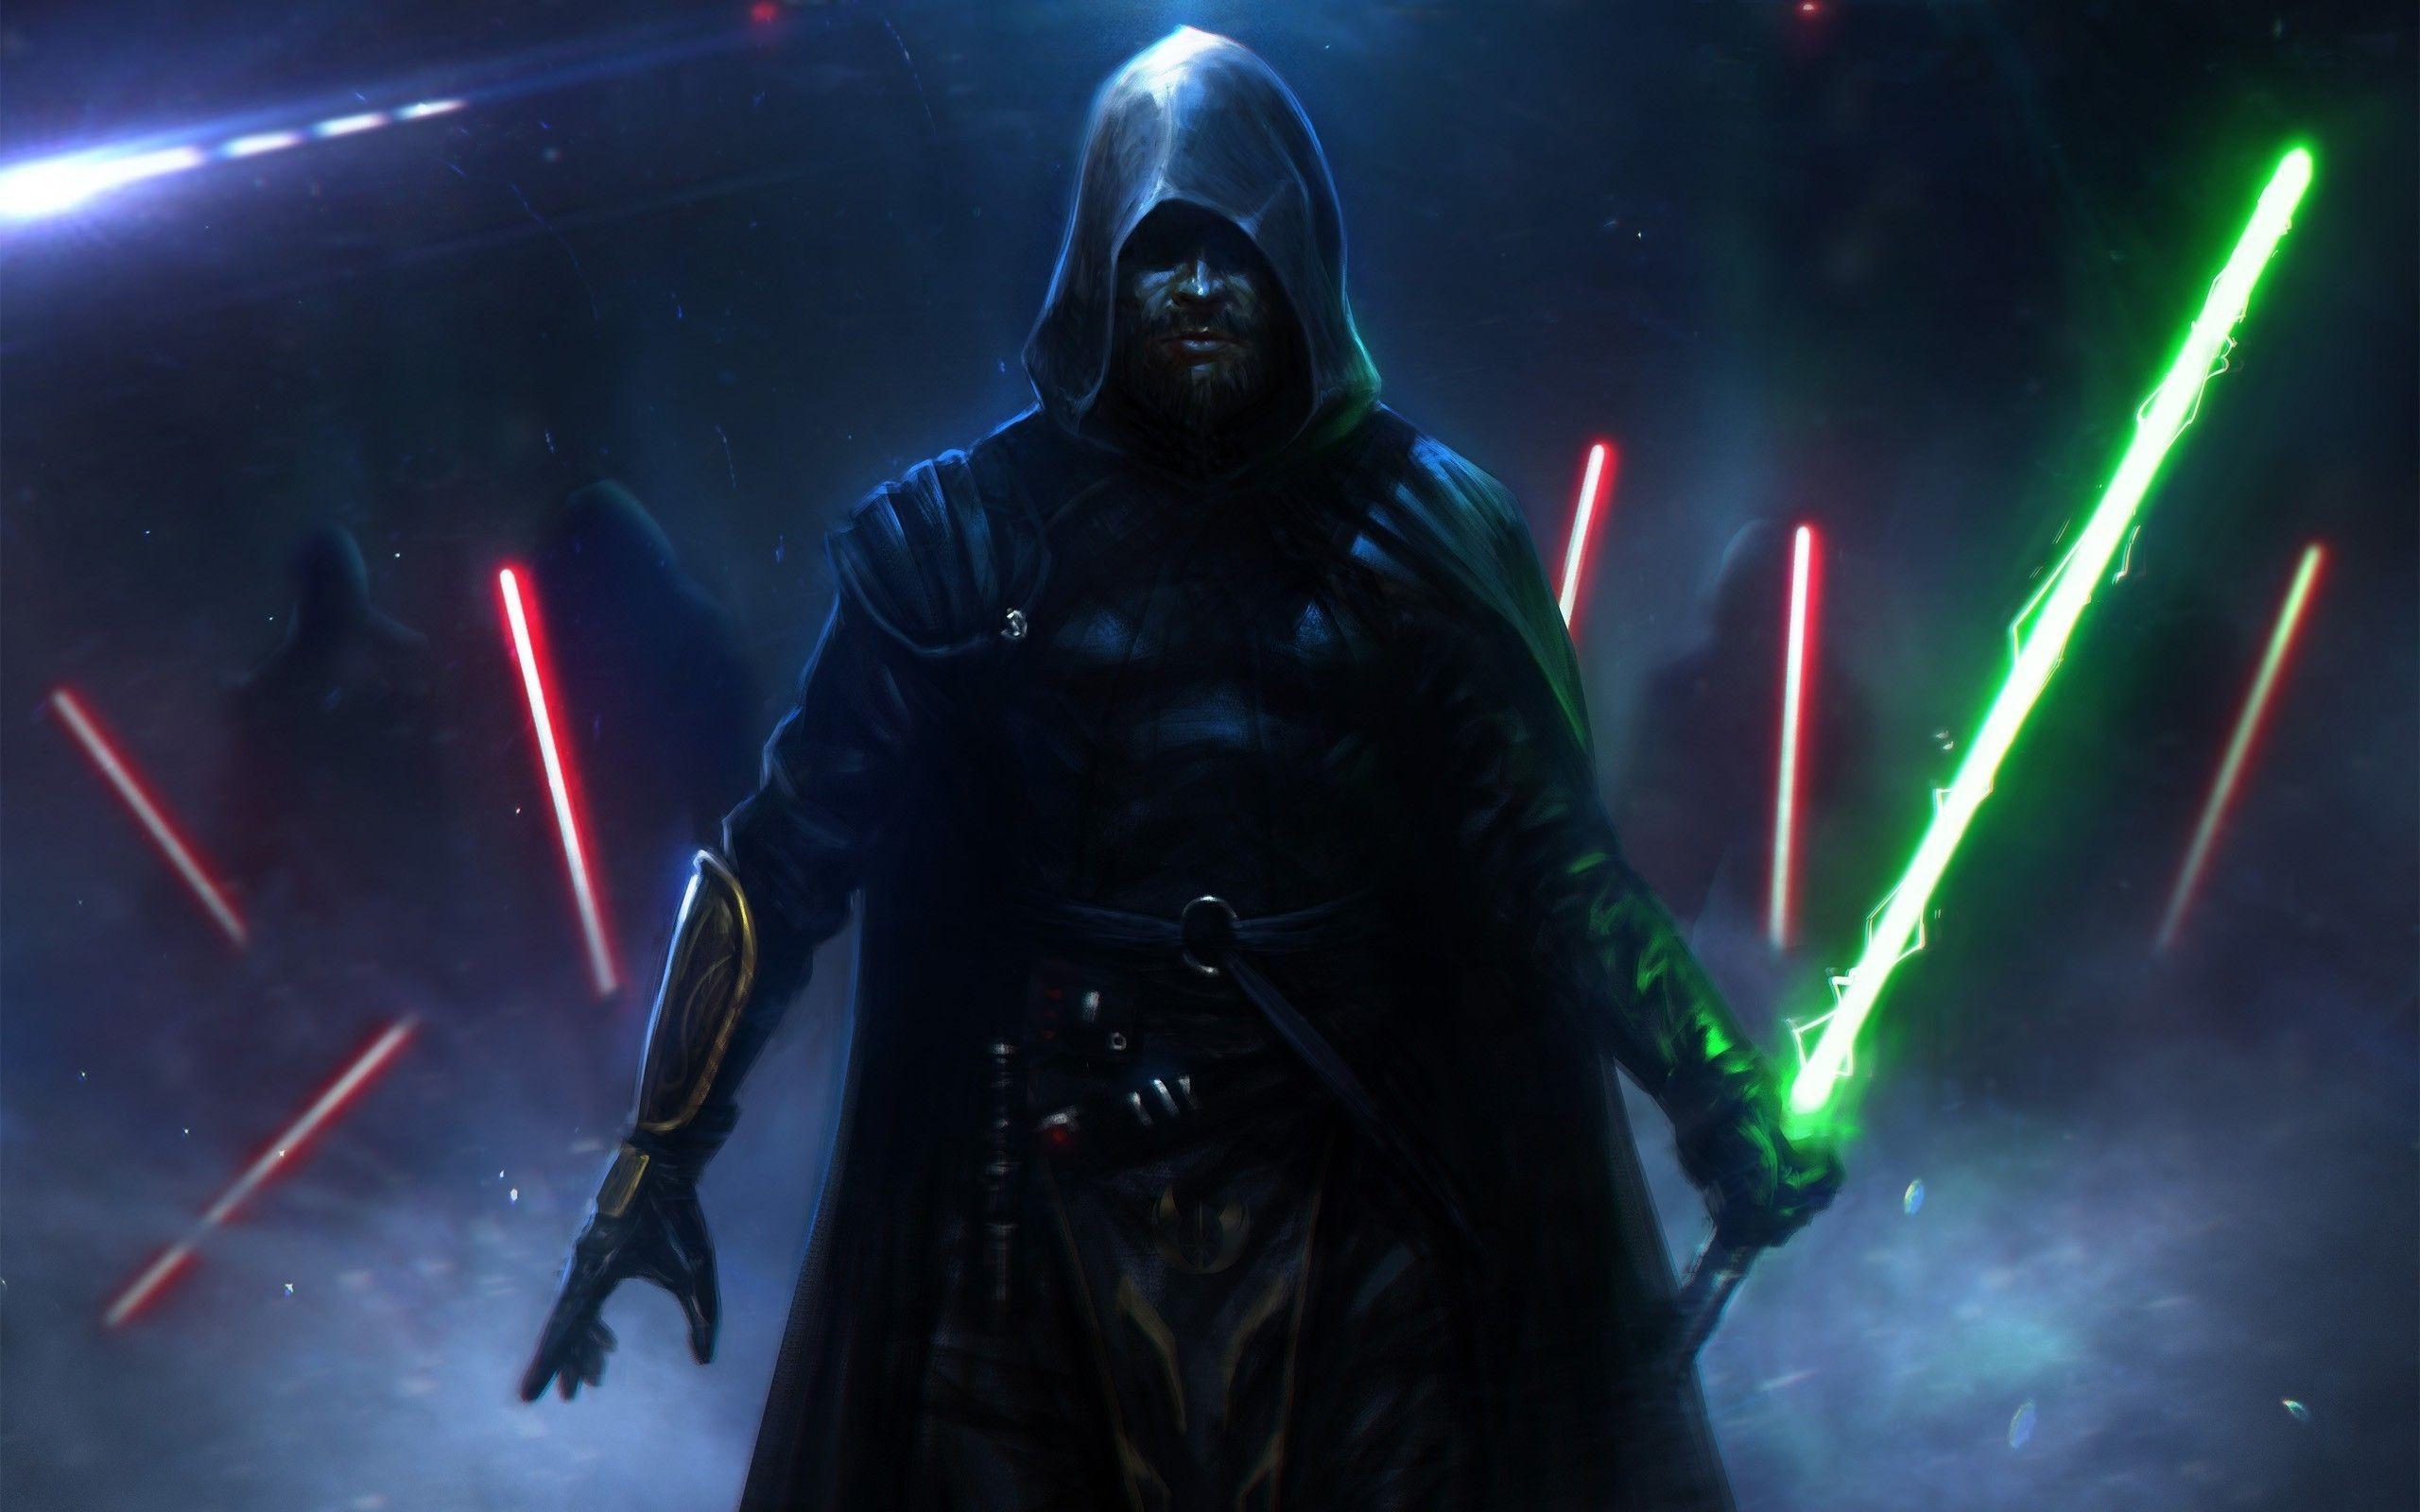 736623 best star wars lightsaber duel wallpaper 2560x1600 for hd 1080p